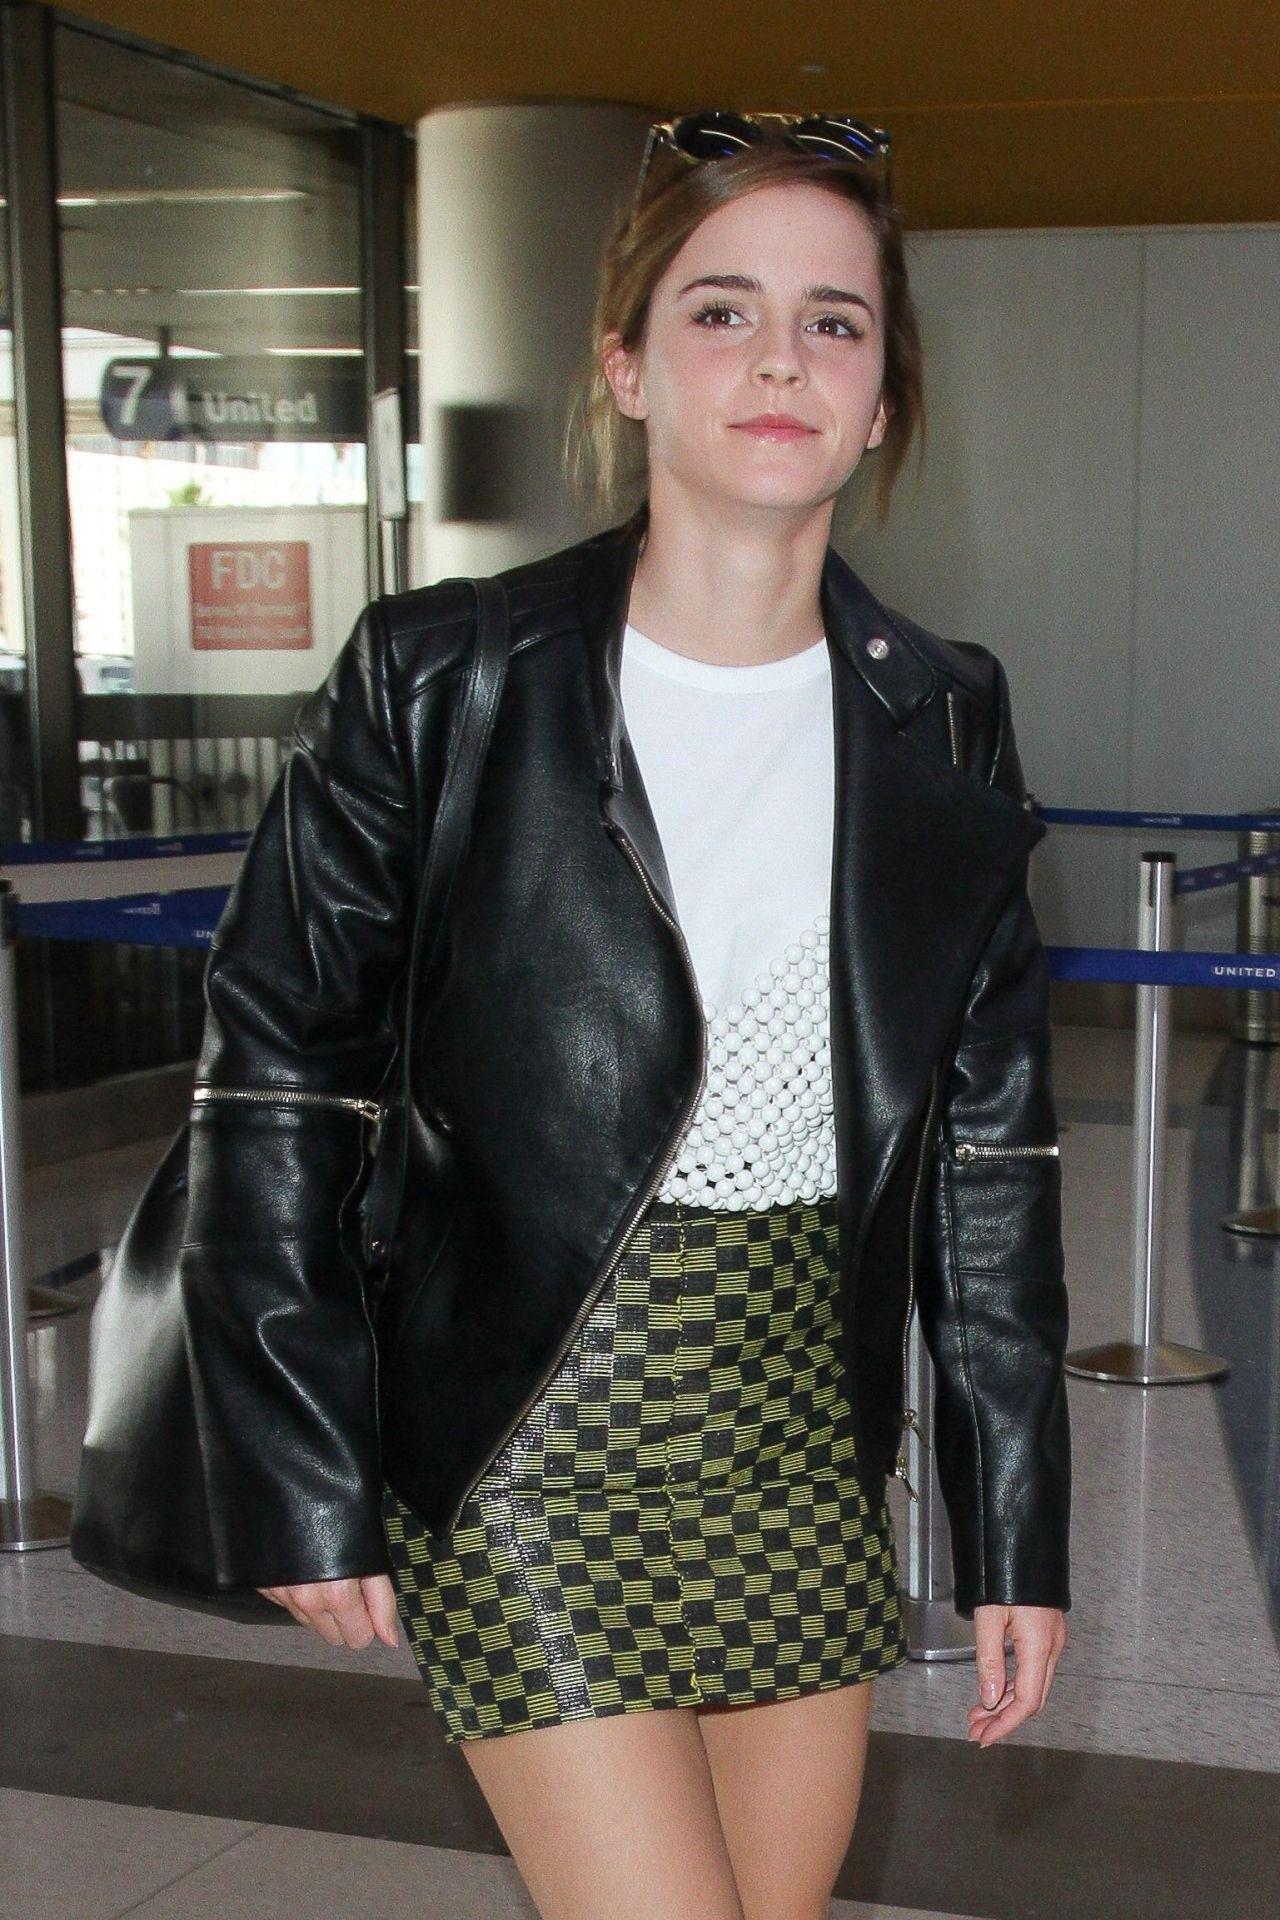 emma watson leggy in mini skirt arrives at los angeles